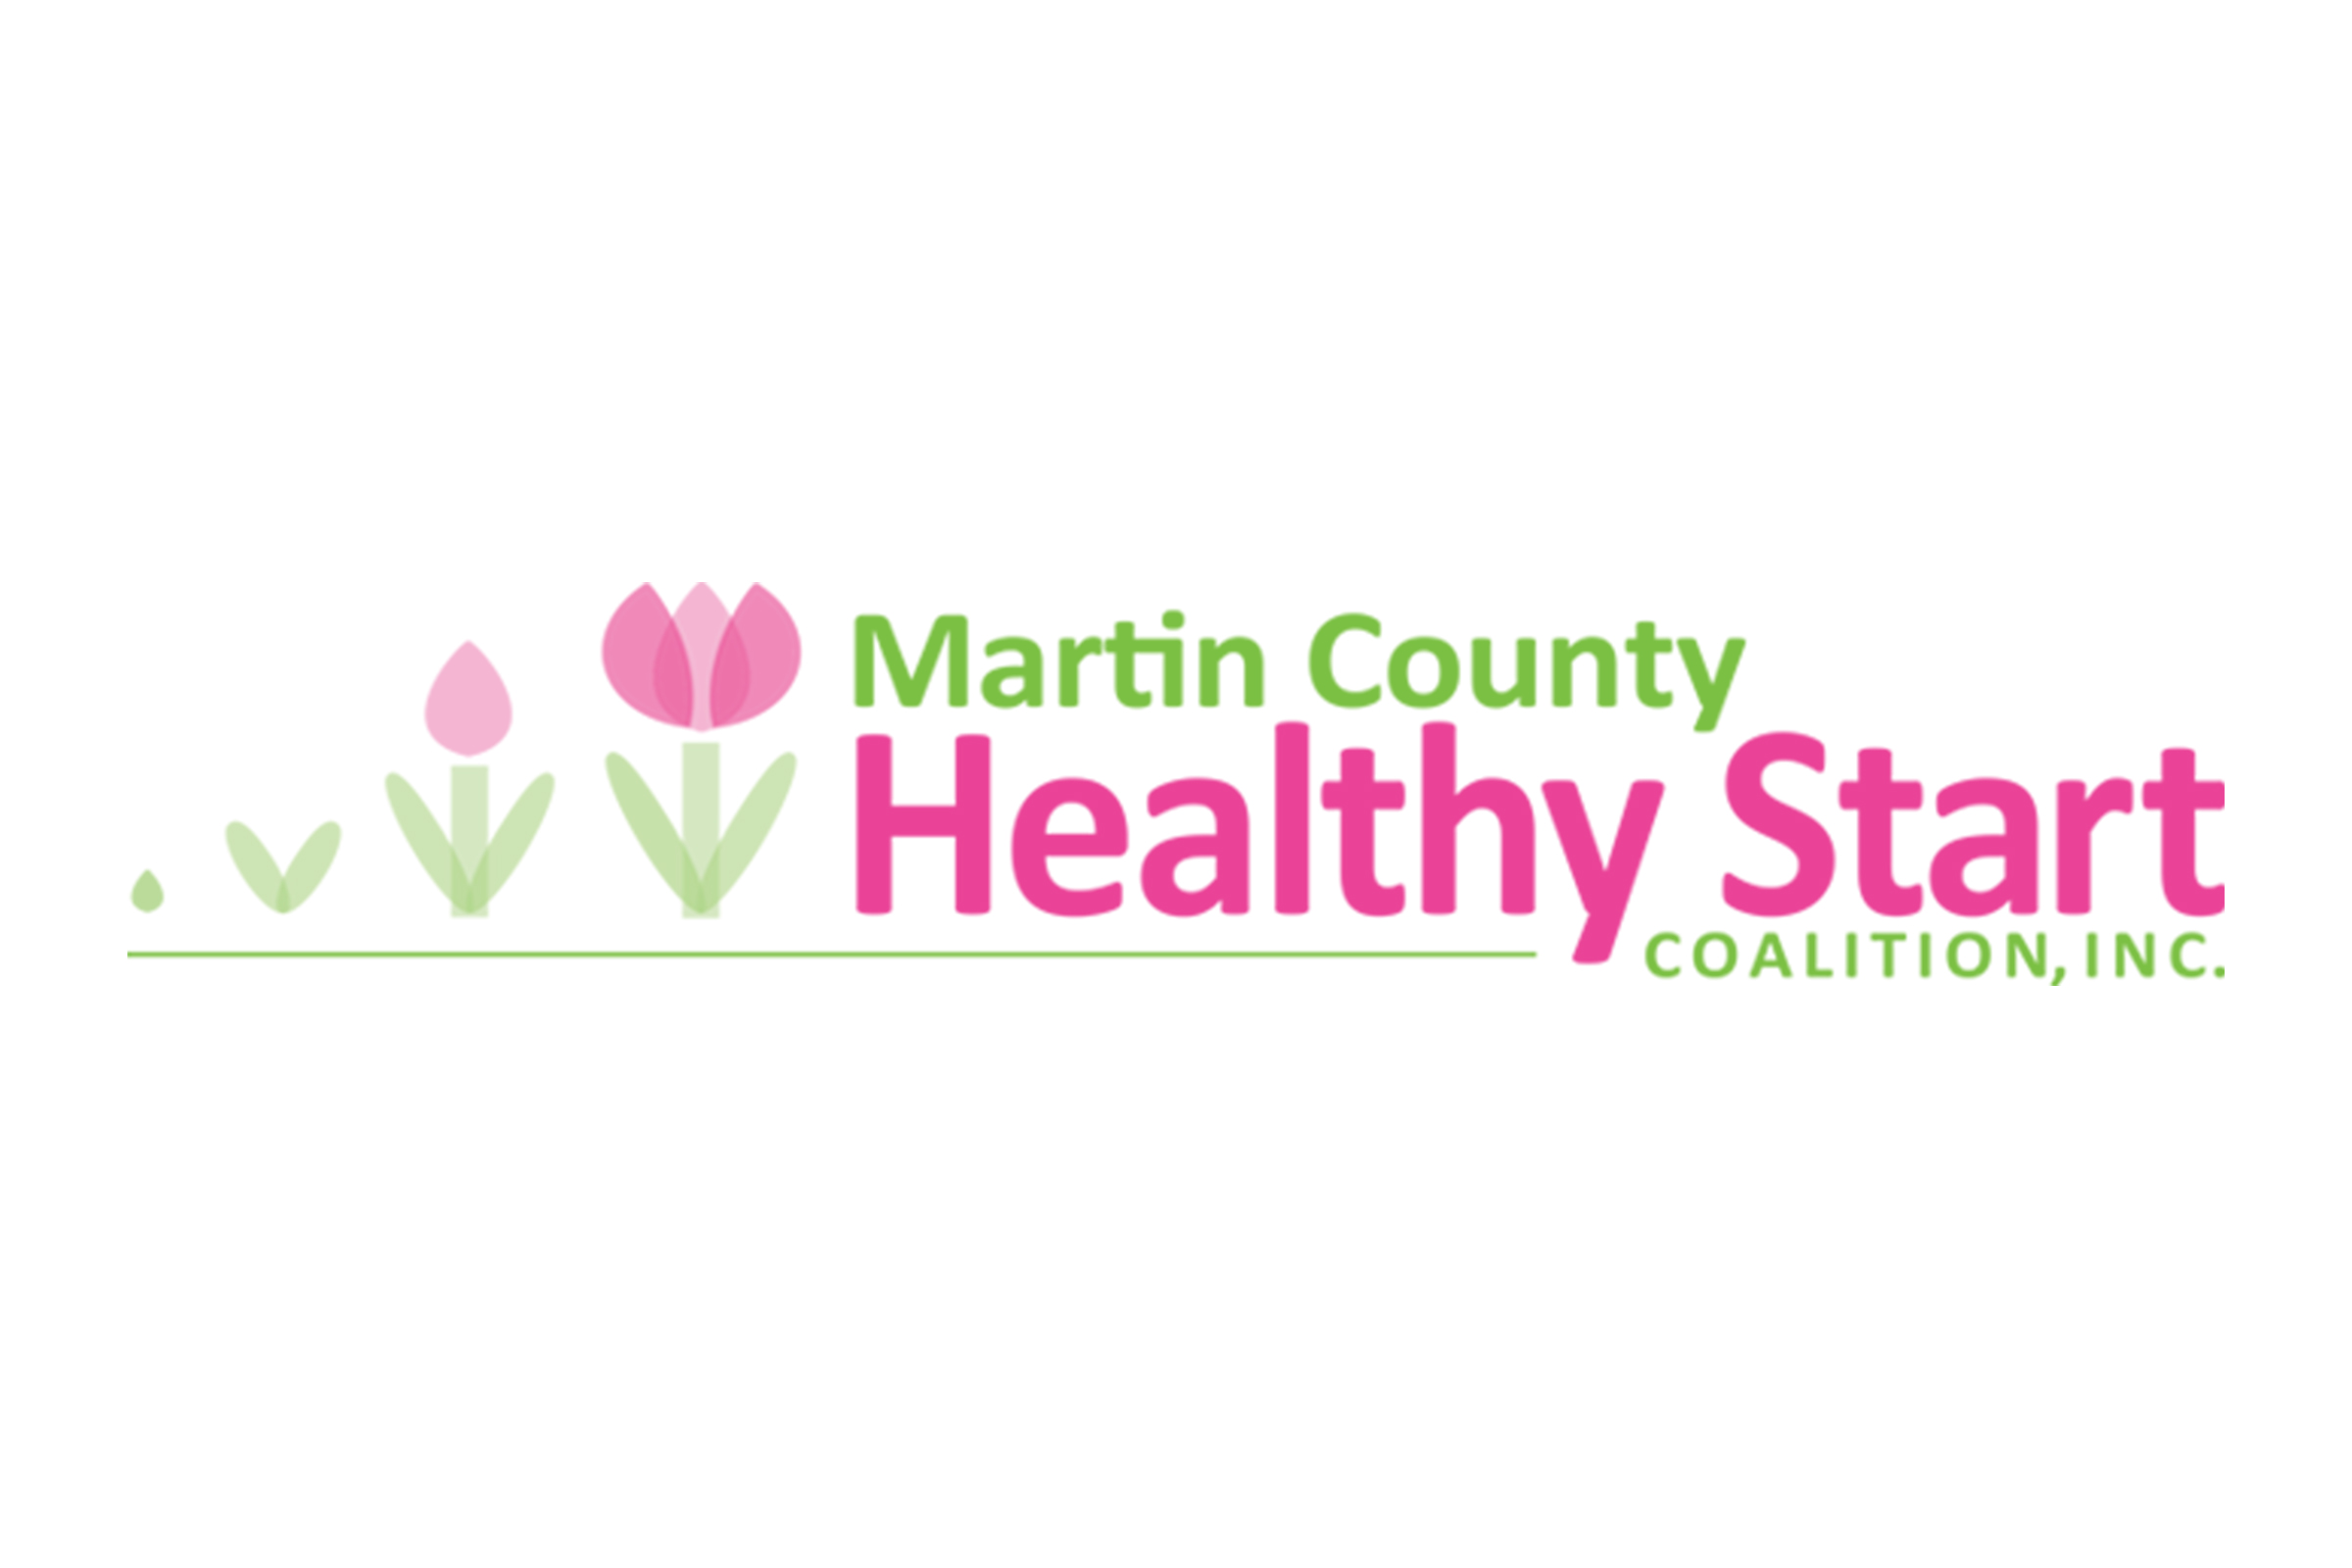 Martin County Healthy Start